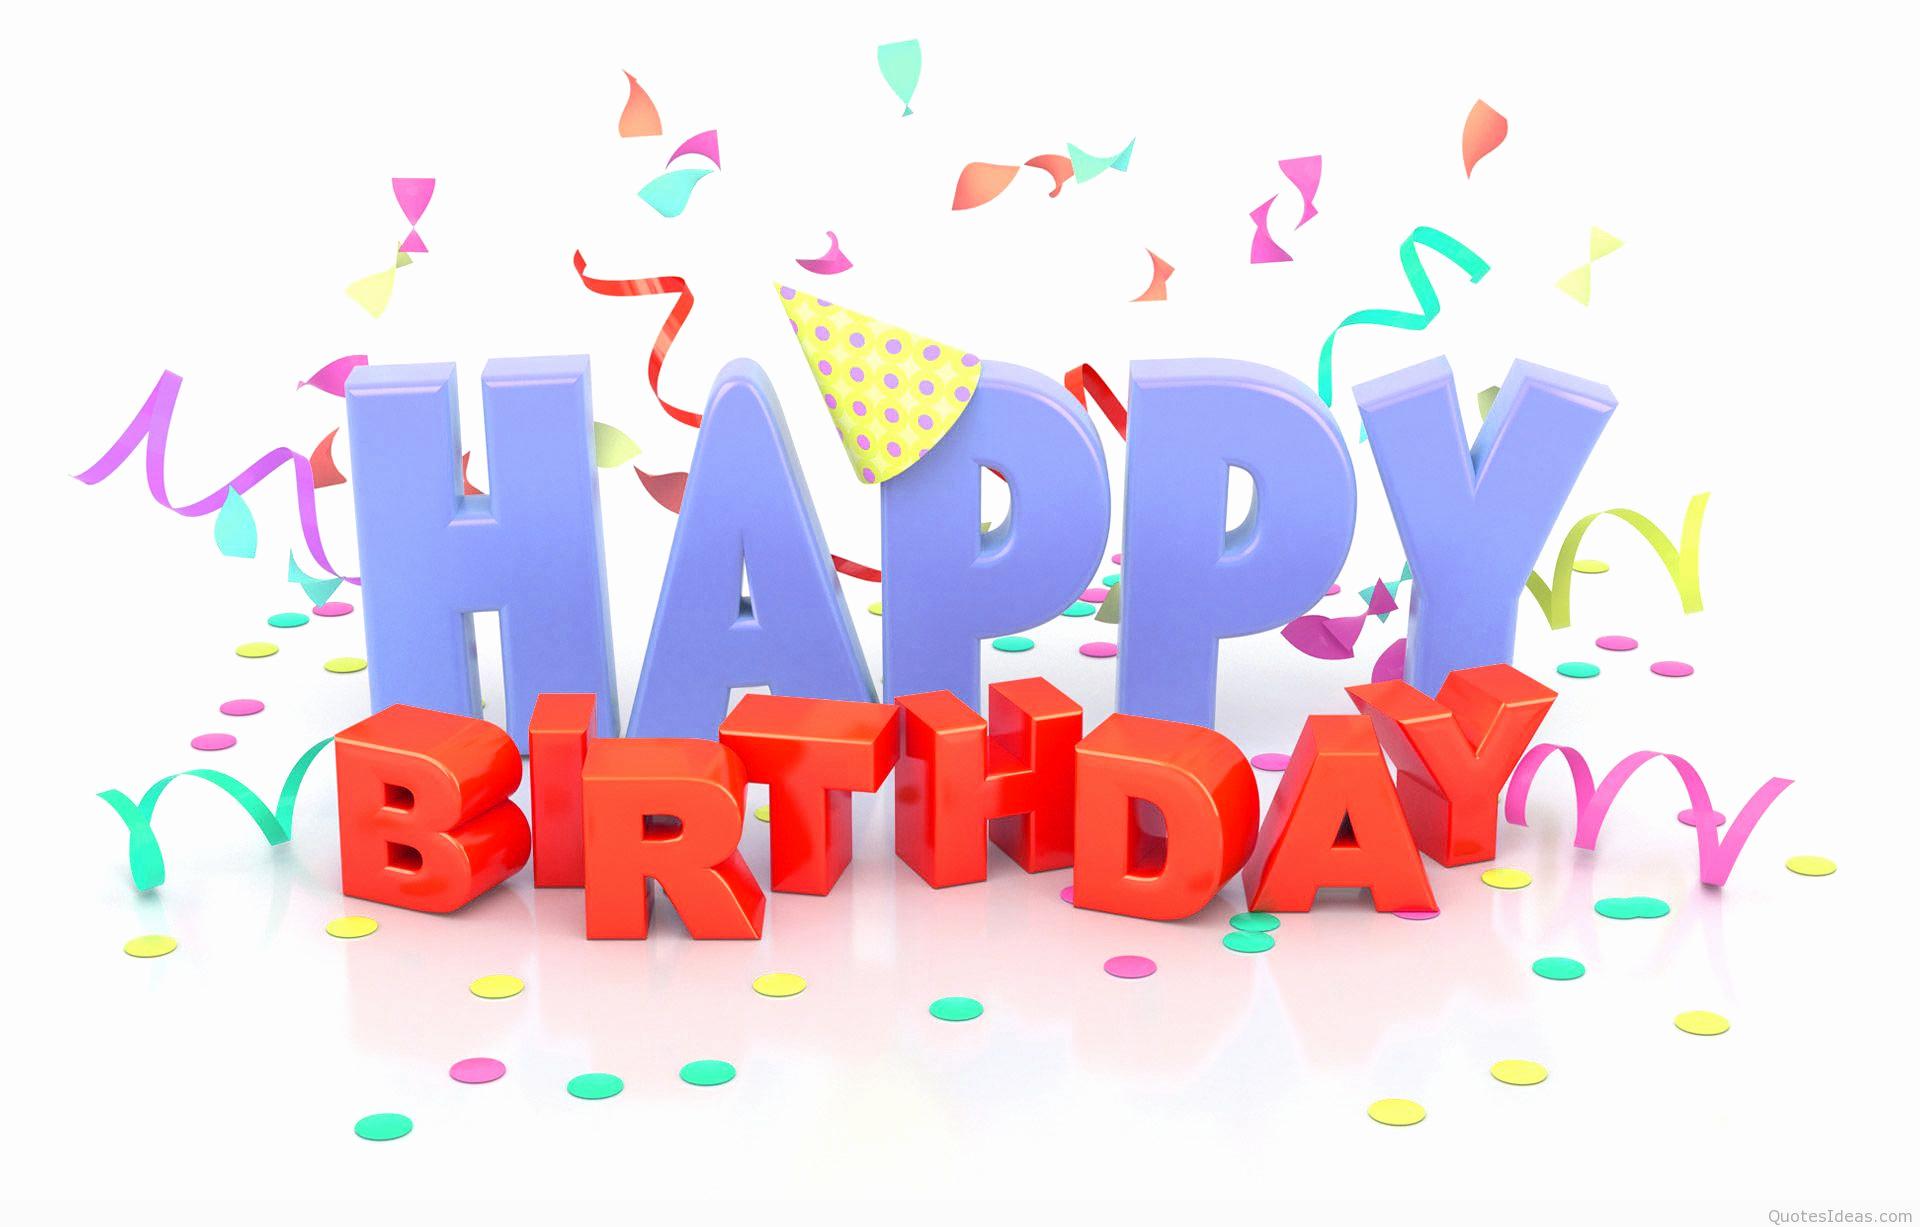 Happy Bday Wallpapers Free Luxury Happy Birthday Wishes Quotes